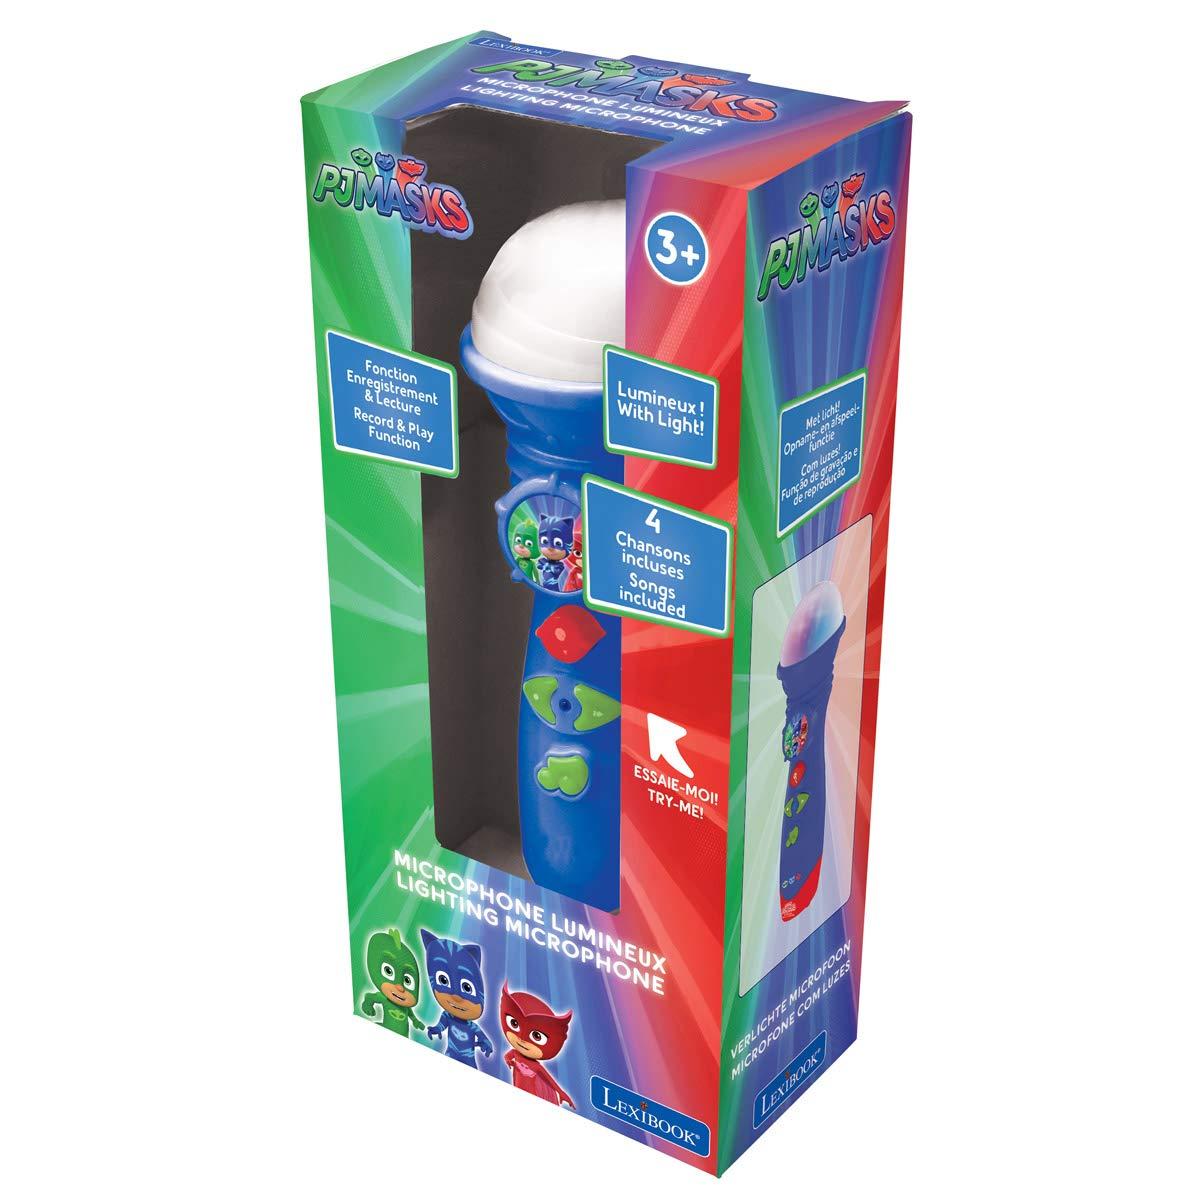 PJ Masks Lexibook Catboy Lightning Microphone, Light Effects, Record and Play, Blue, MIC50PJM by PJ Masks (Image #6)